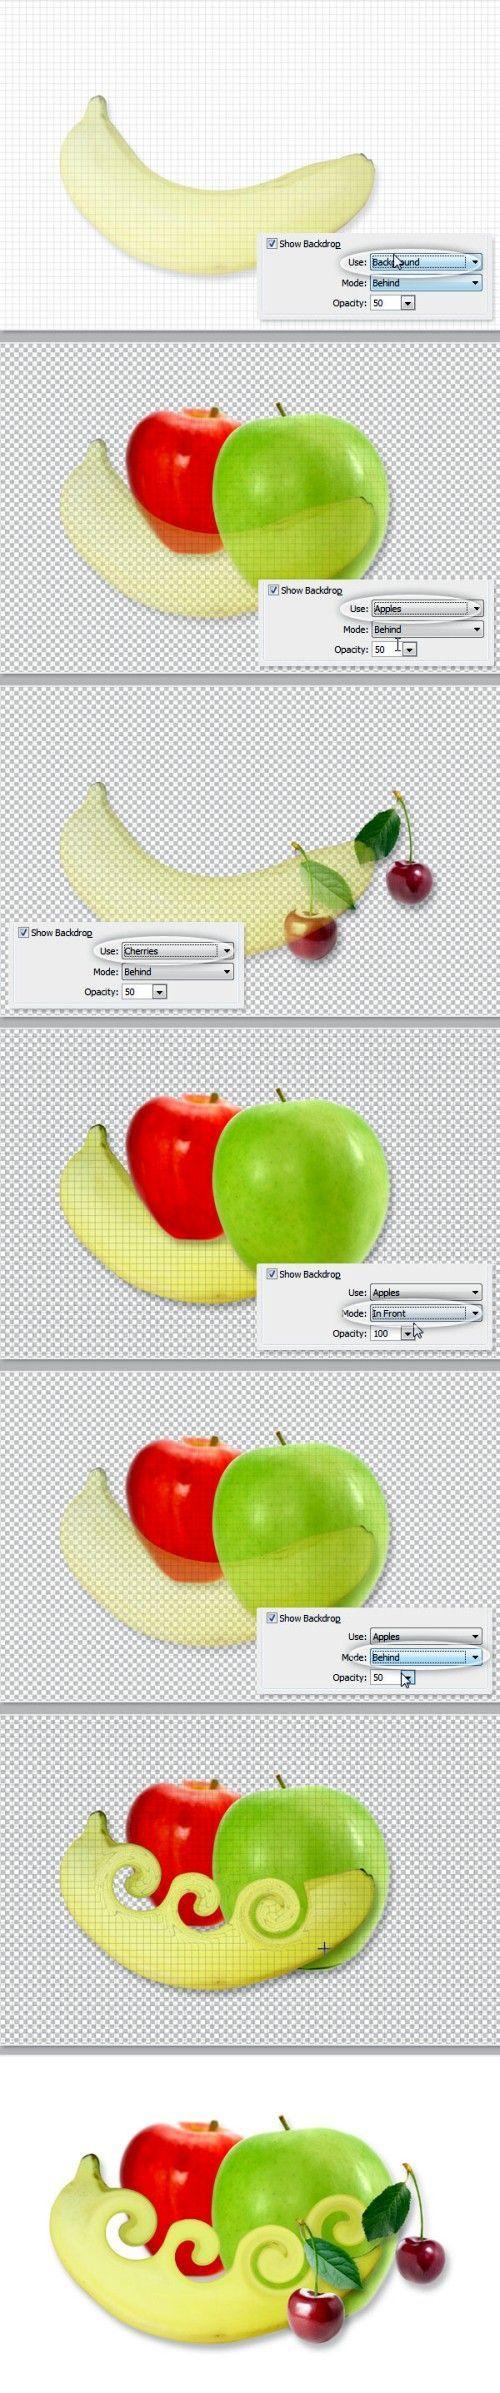 Фильтр Liquify (Пластика) в Фотошоп